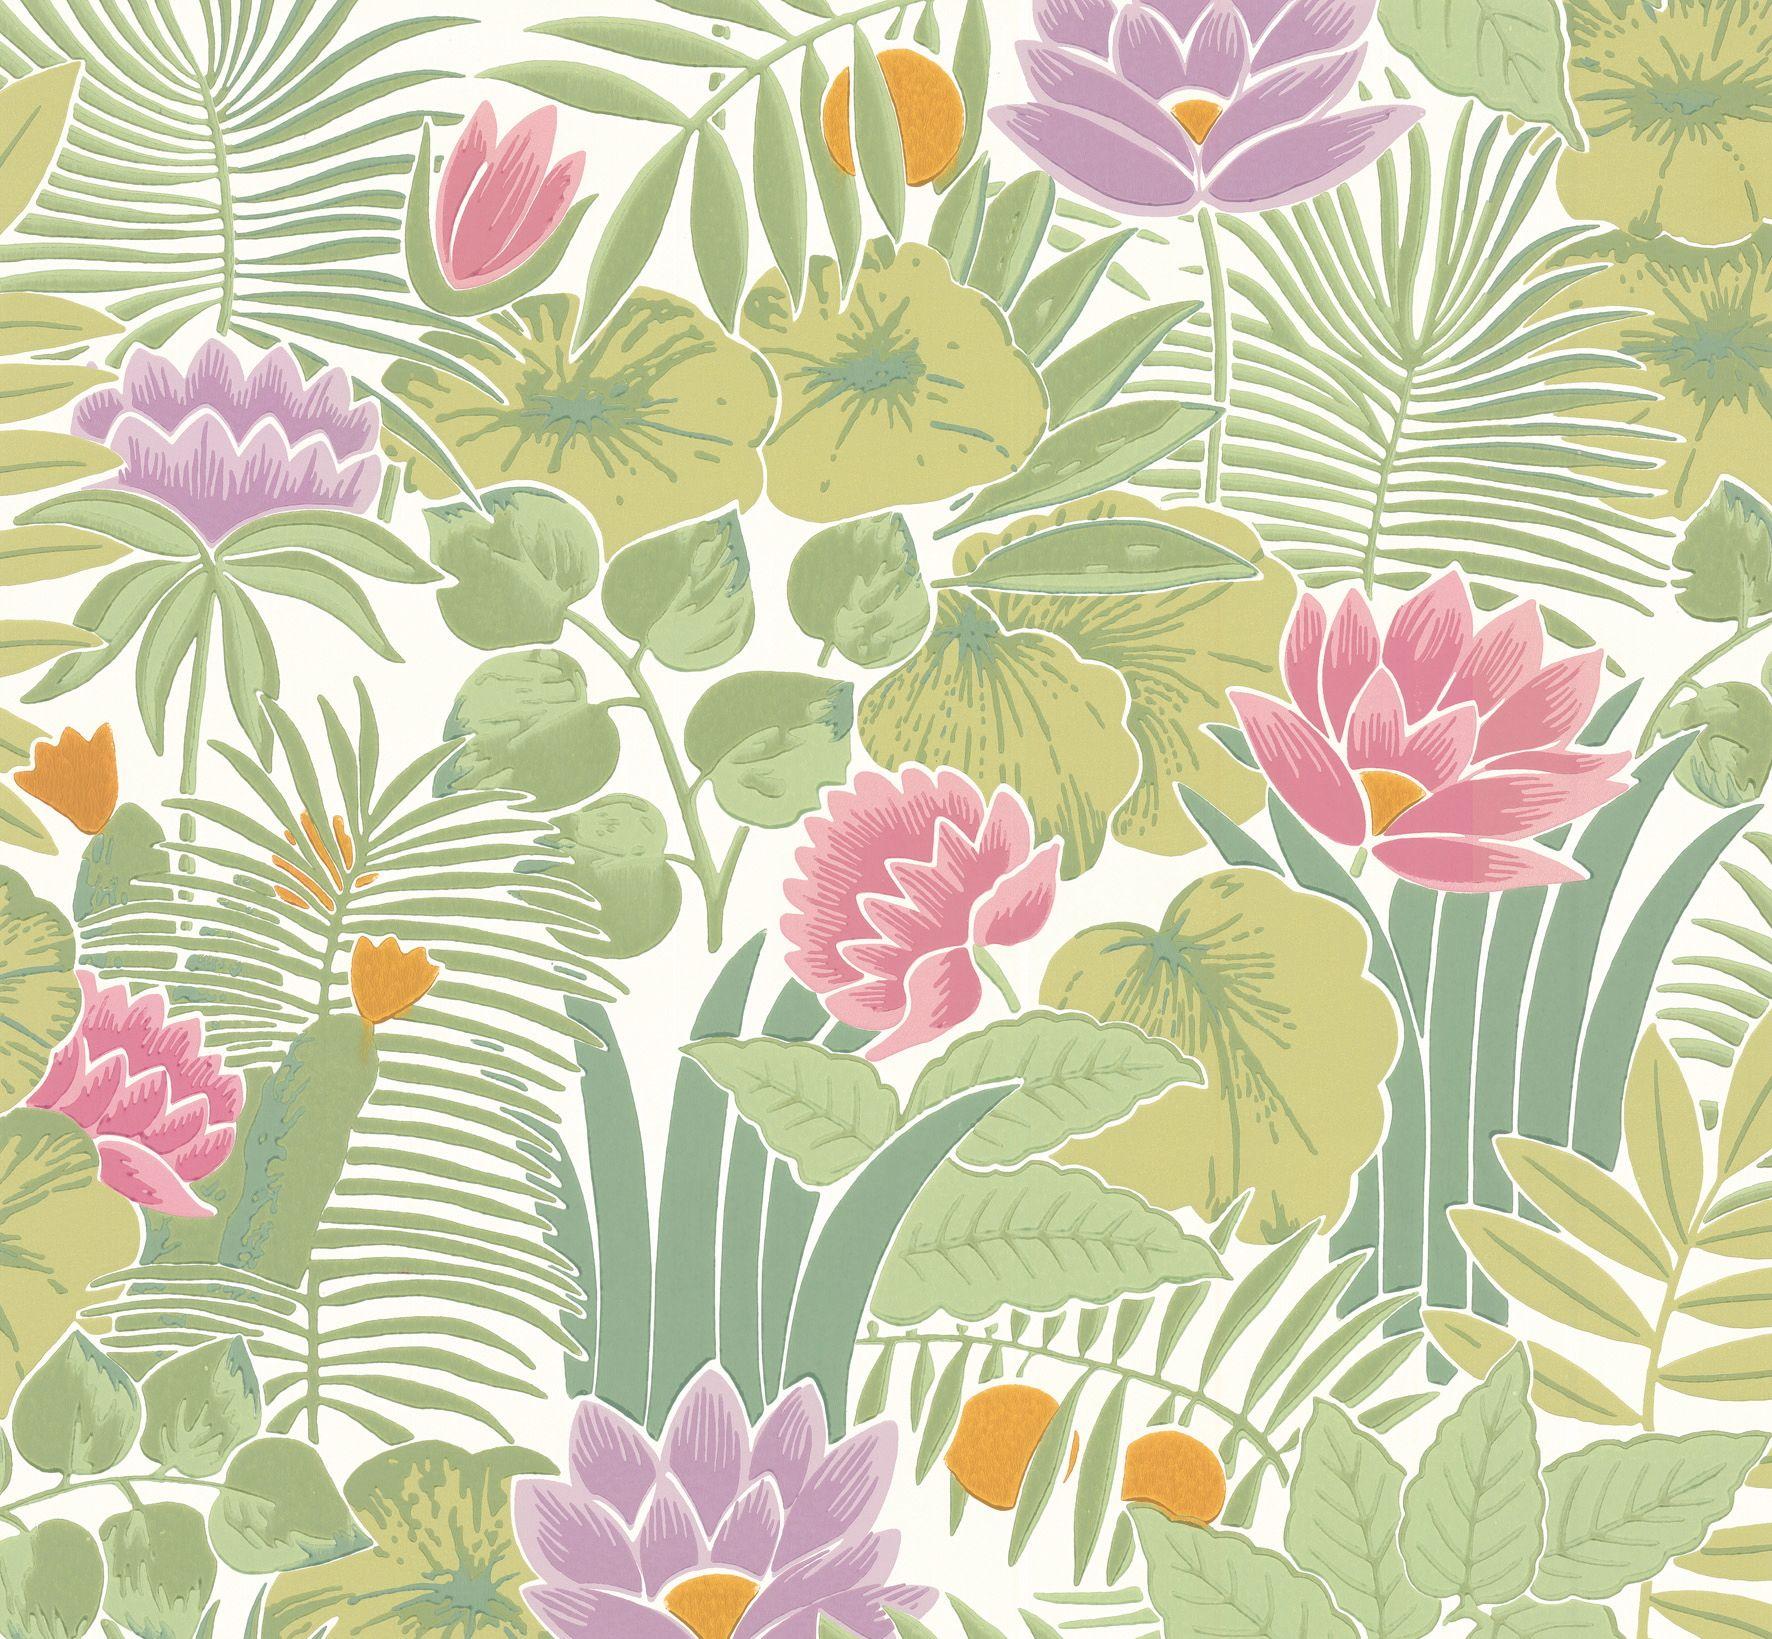 #LittleGreene - Collection Retrospective Papers - papier peint Reverie coloris jardin - Little Greene www.littlegreene.fr/